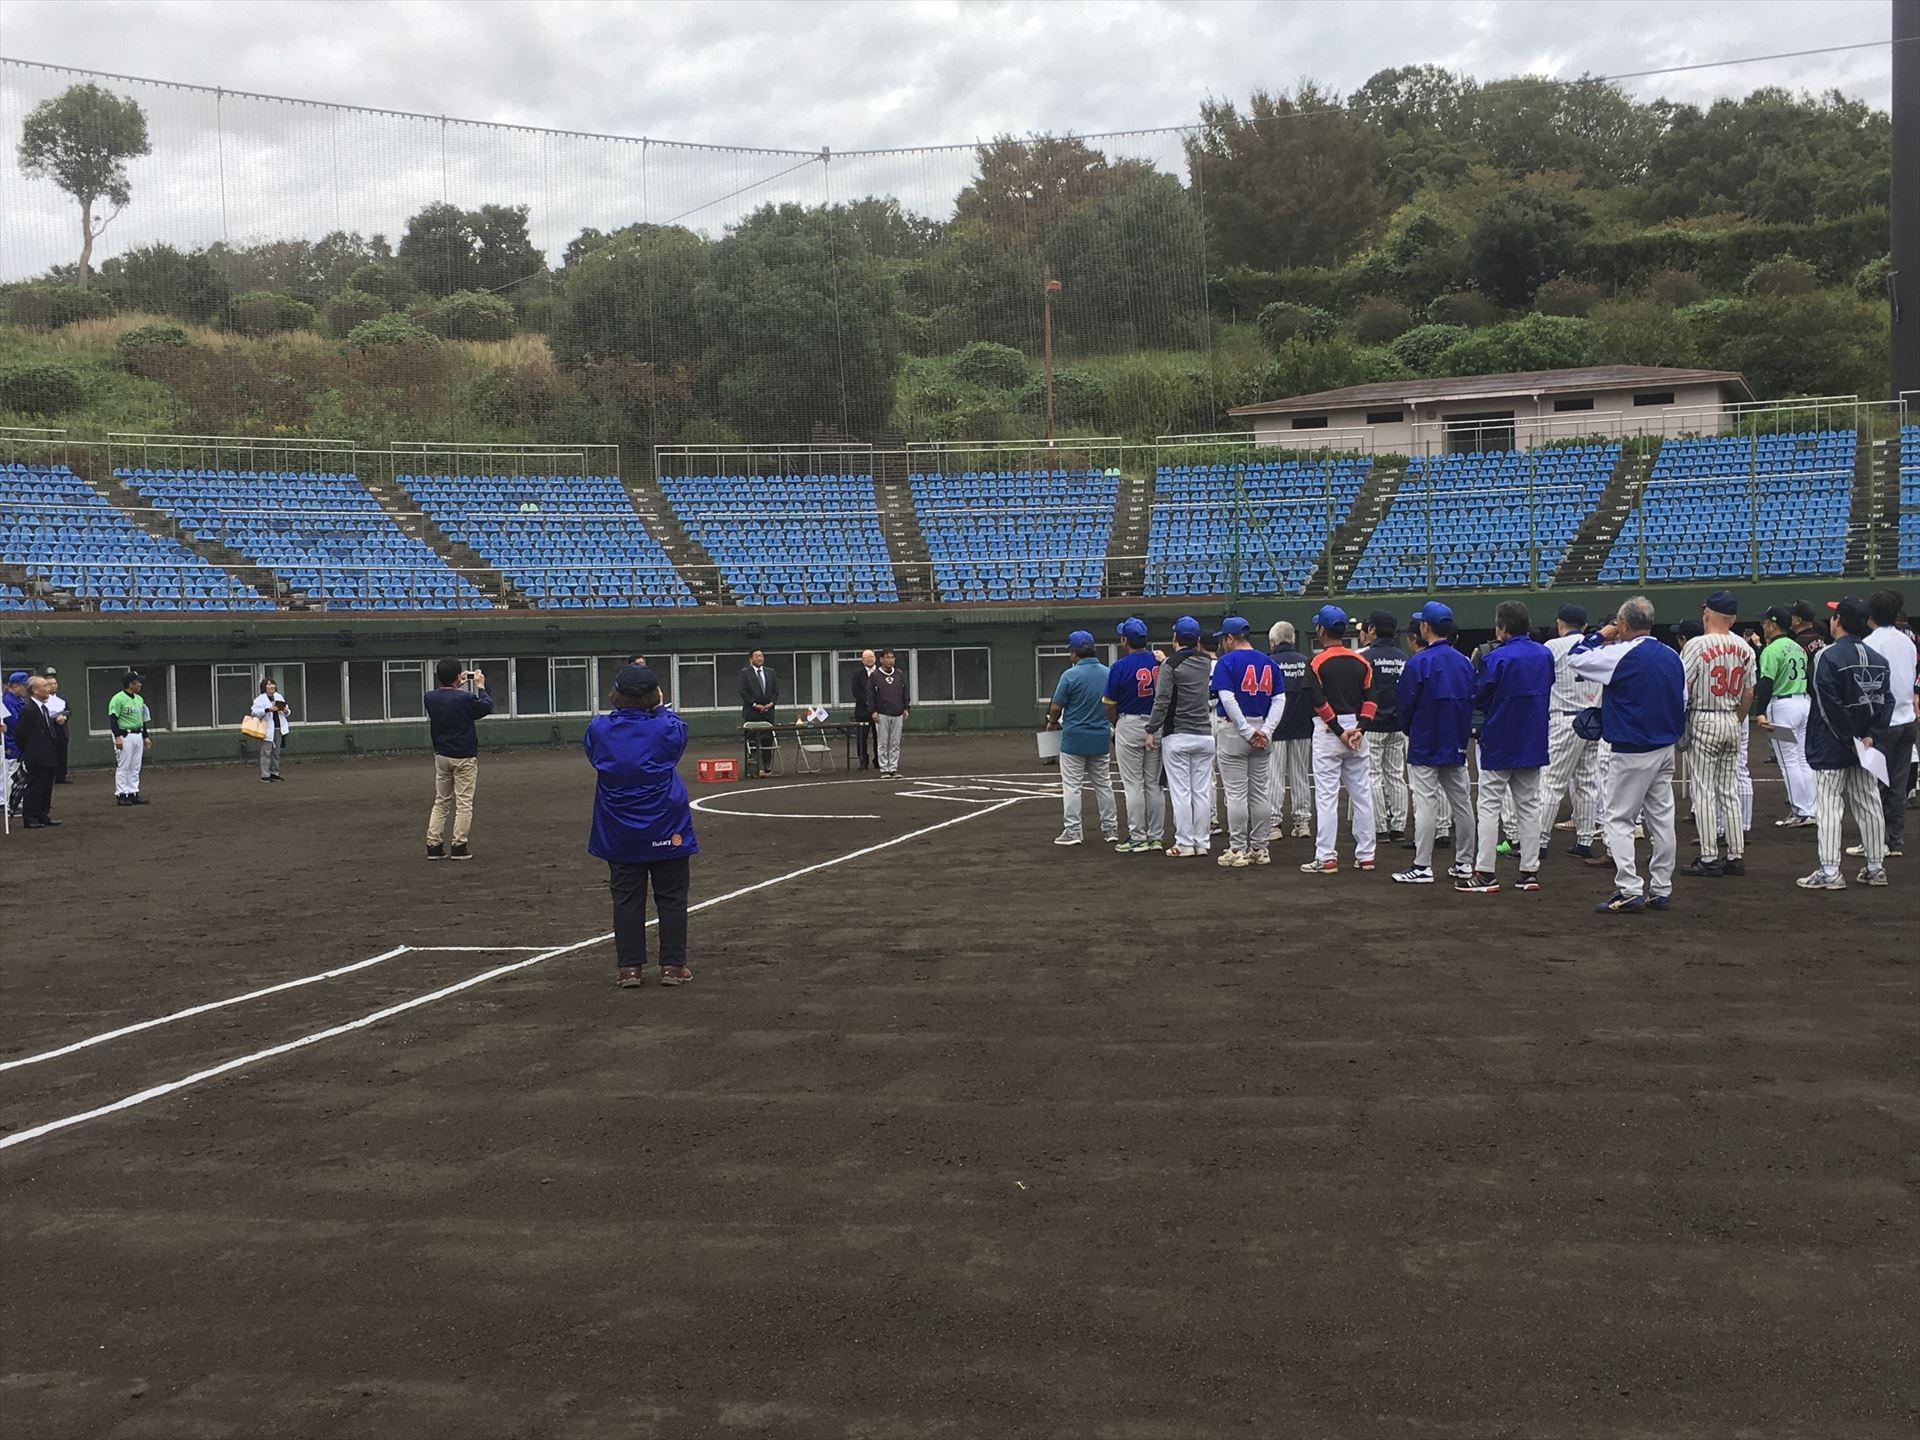 20181012_baseball_011